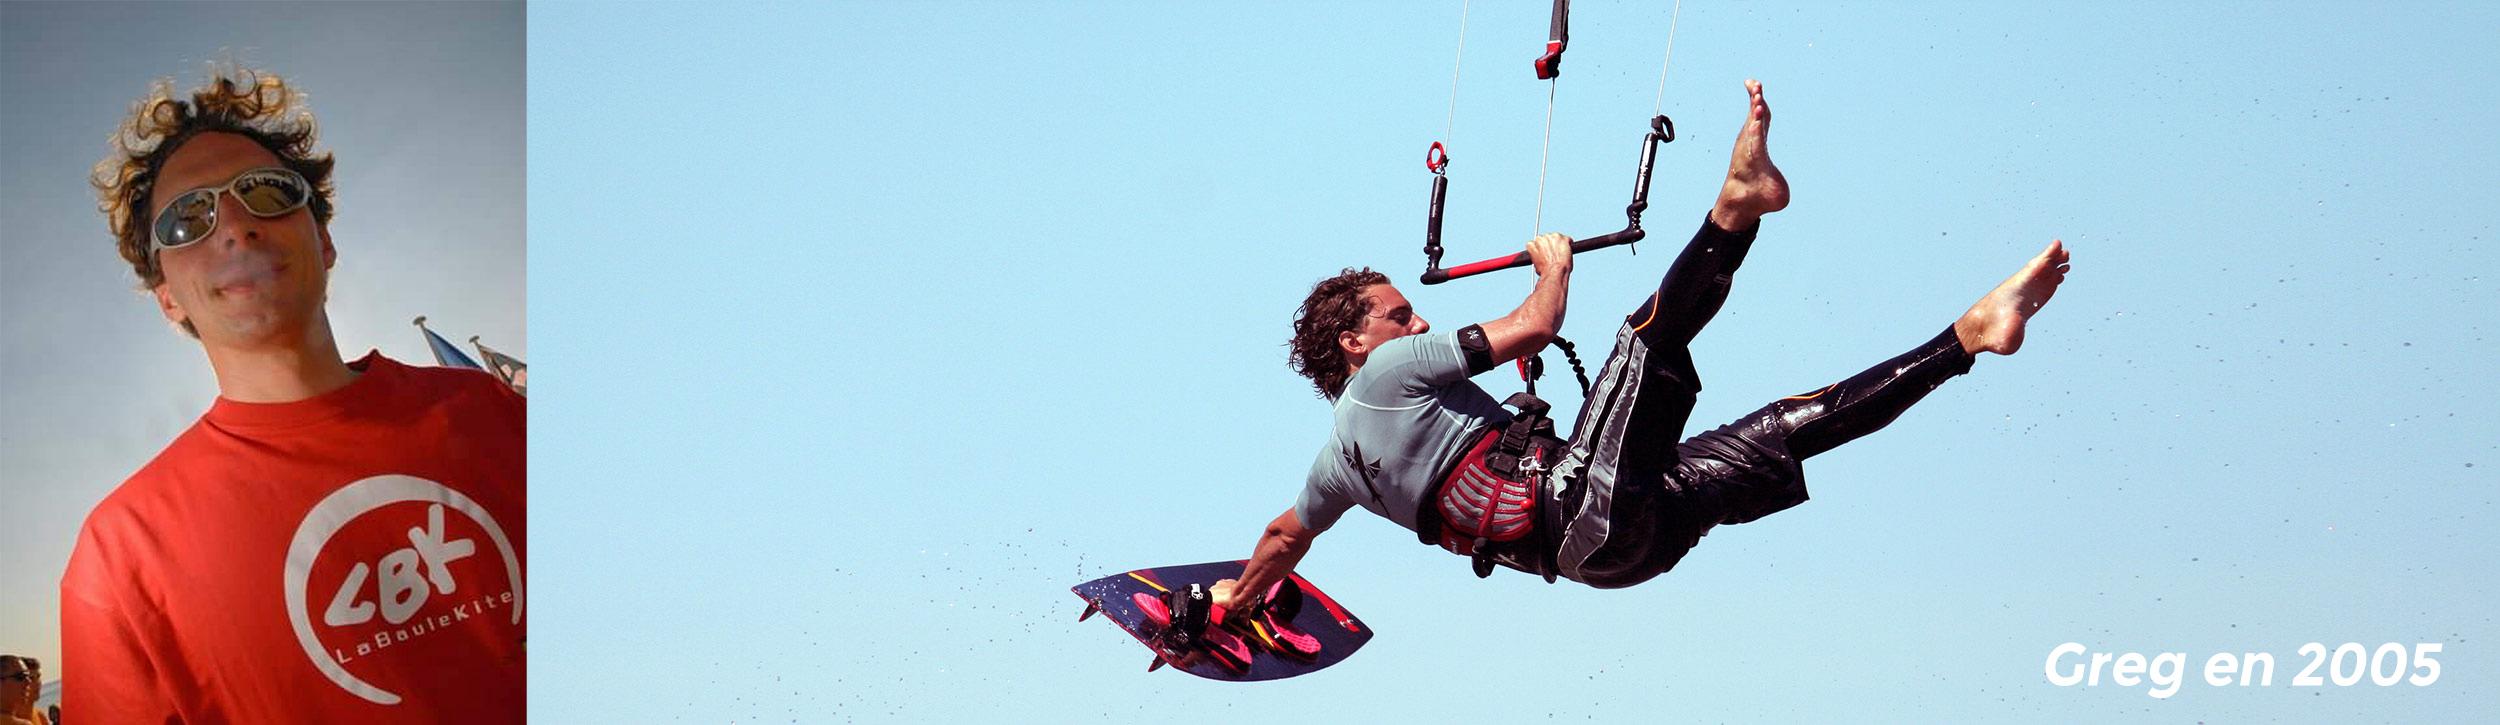 2004-kitesurf-fondateur-Greg-Nicholls-best-kiteboarding